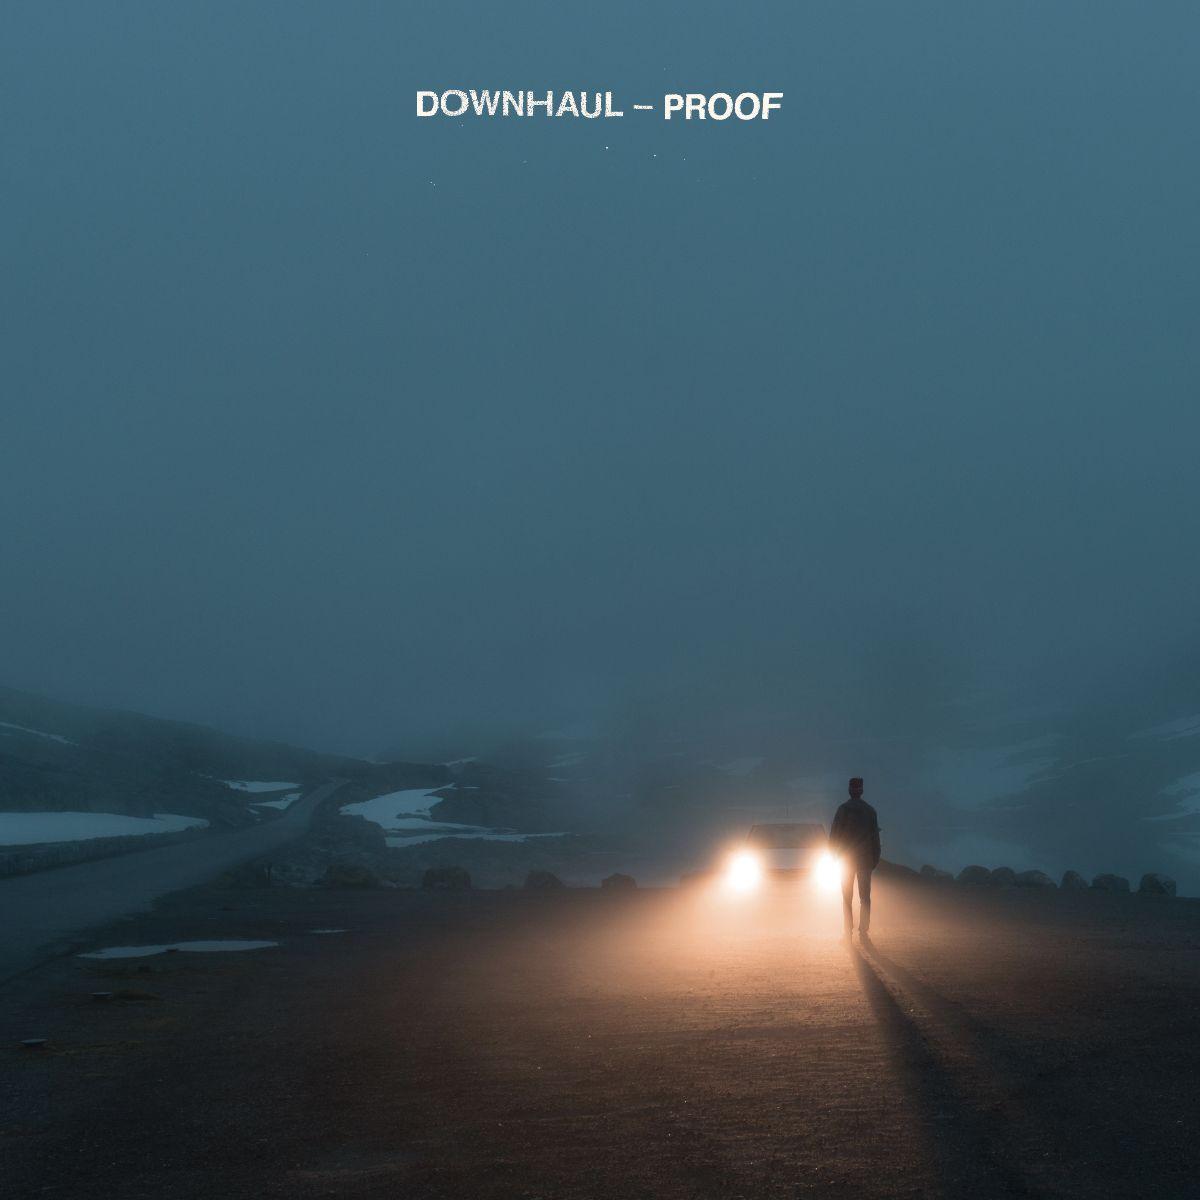 Downhaul - PROOF